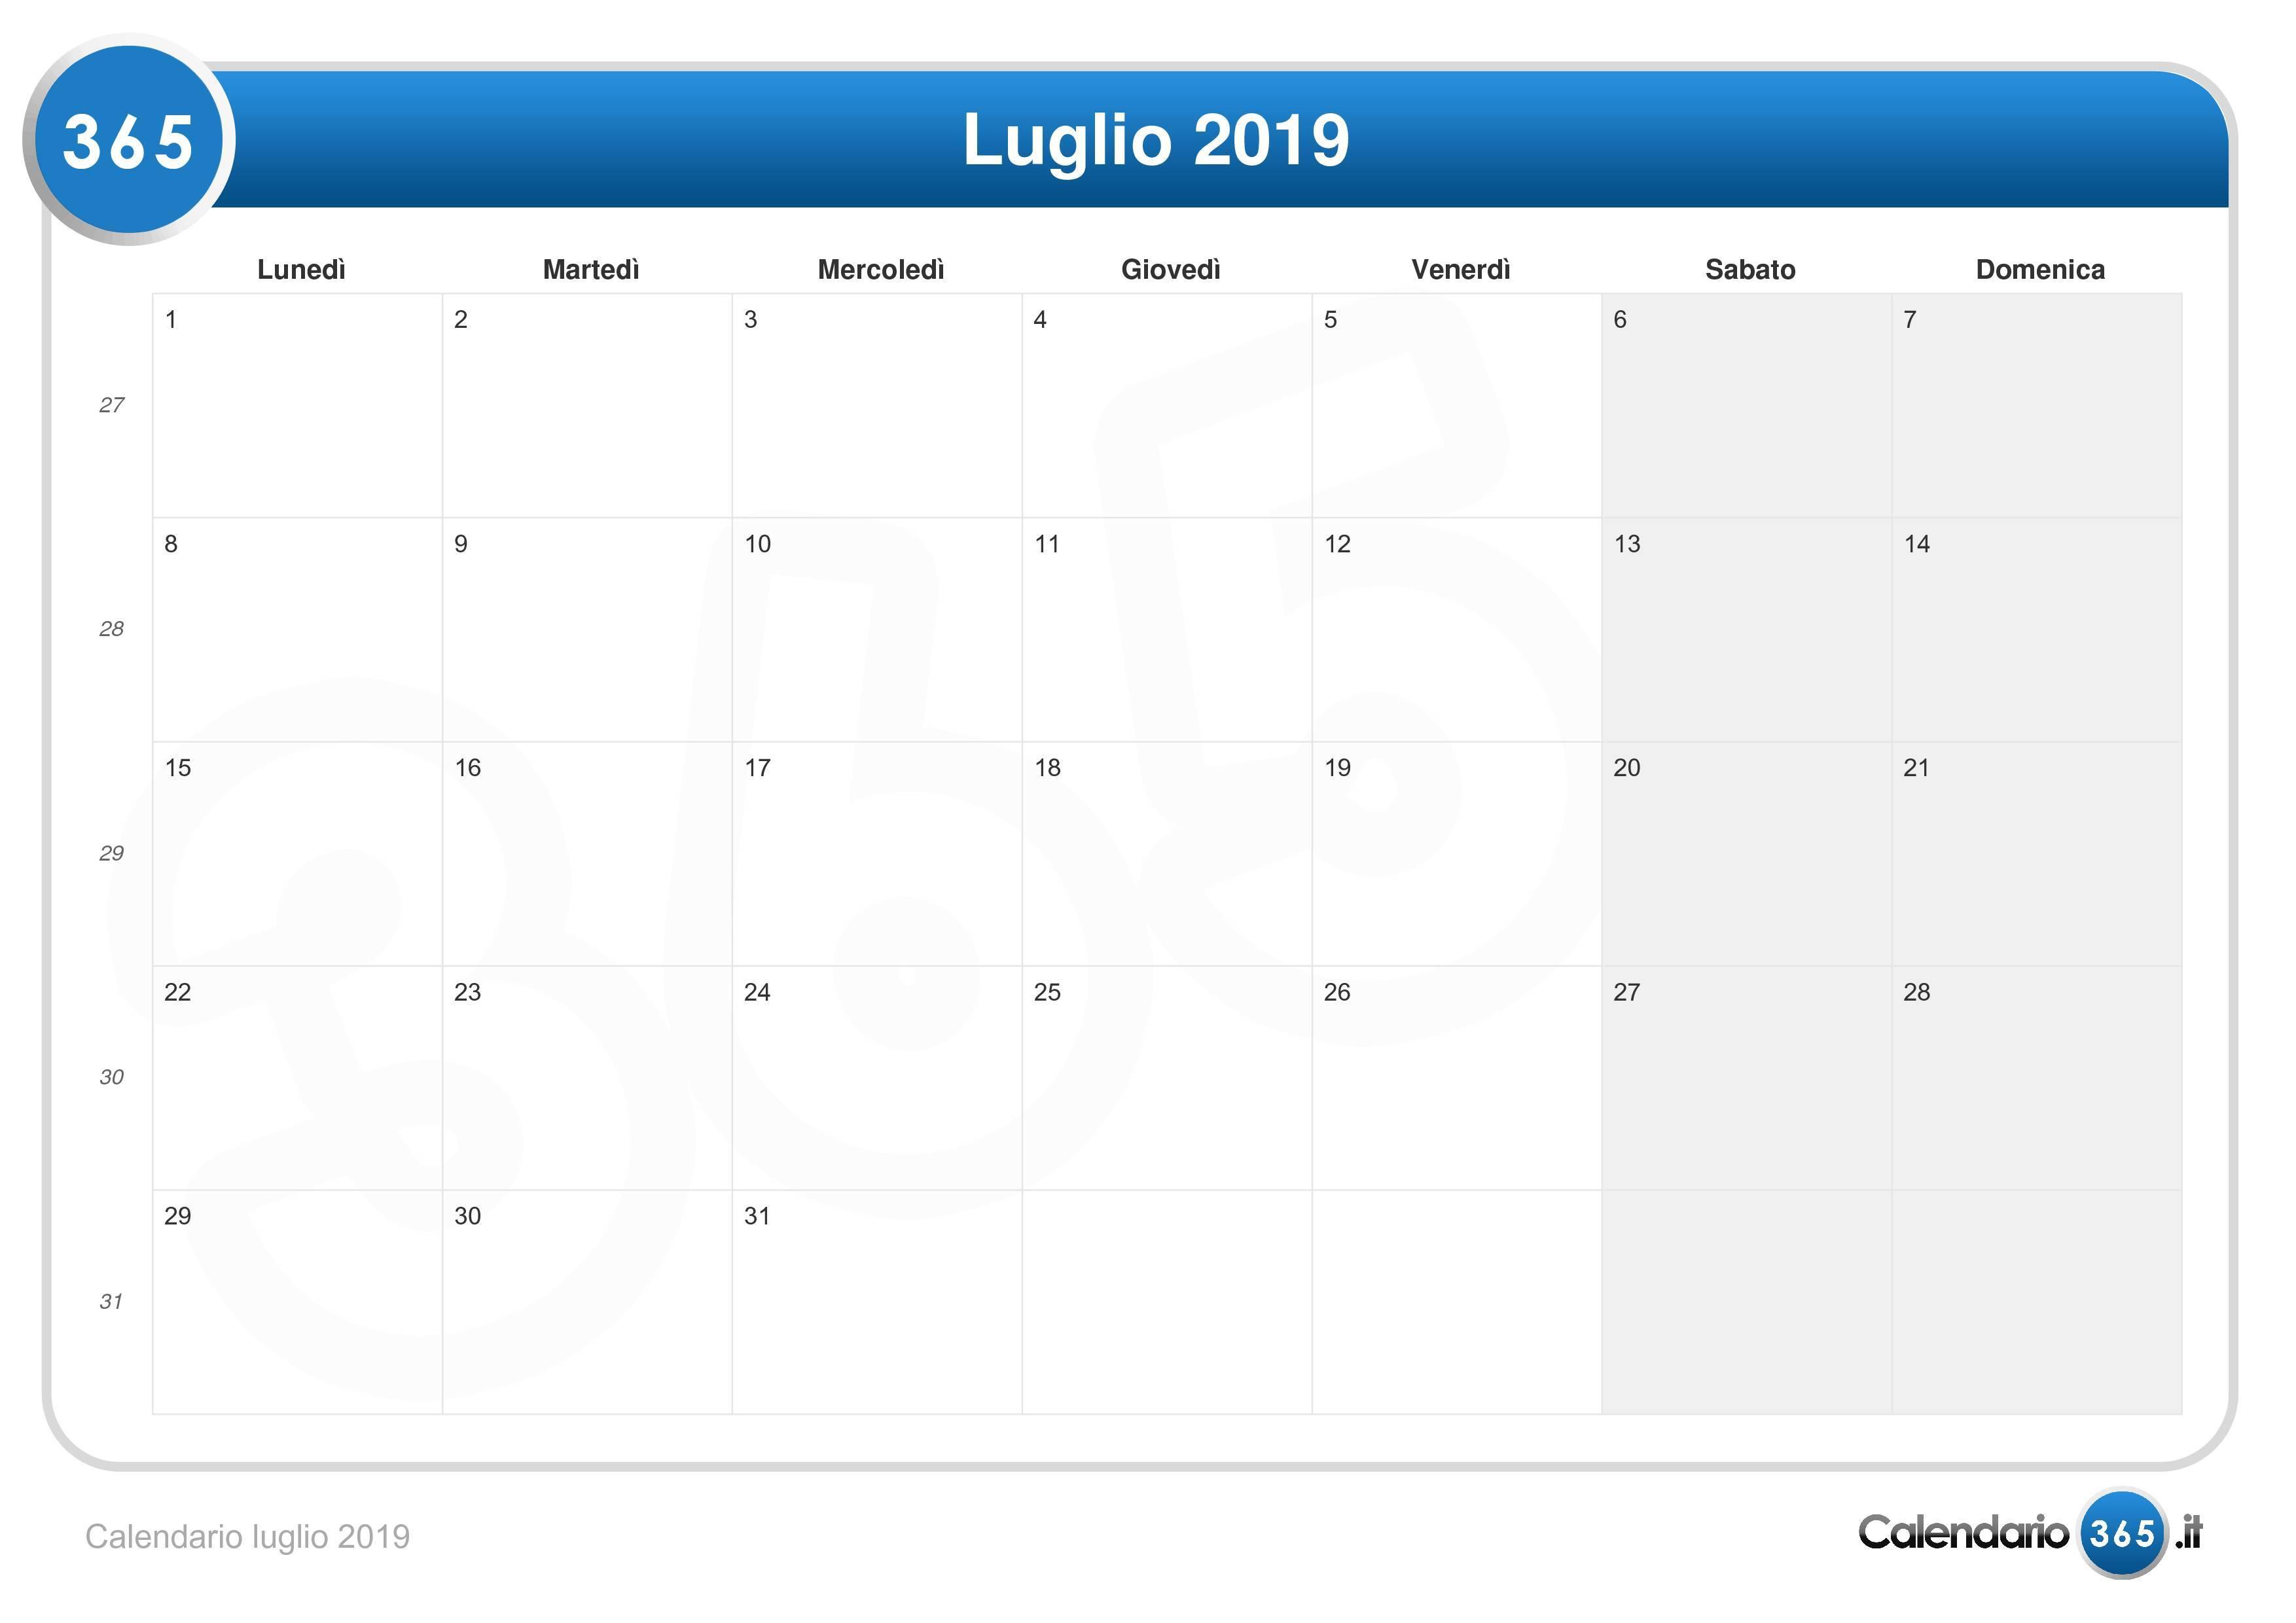 Calendario Luglio 2019